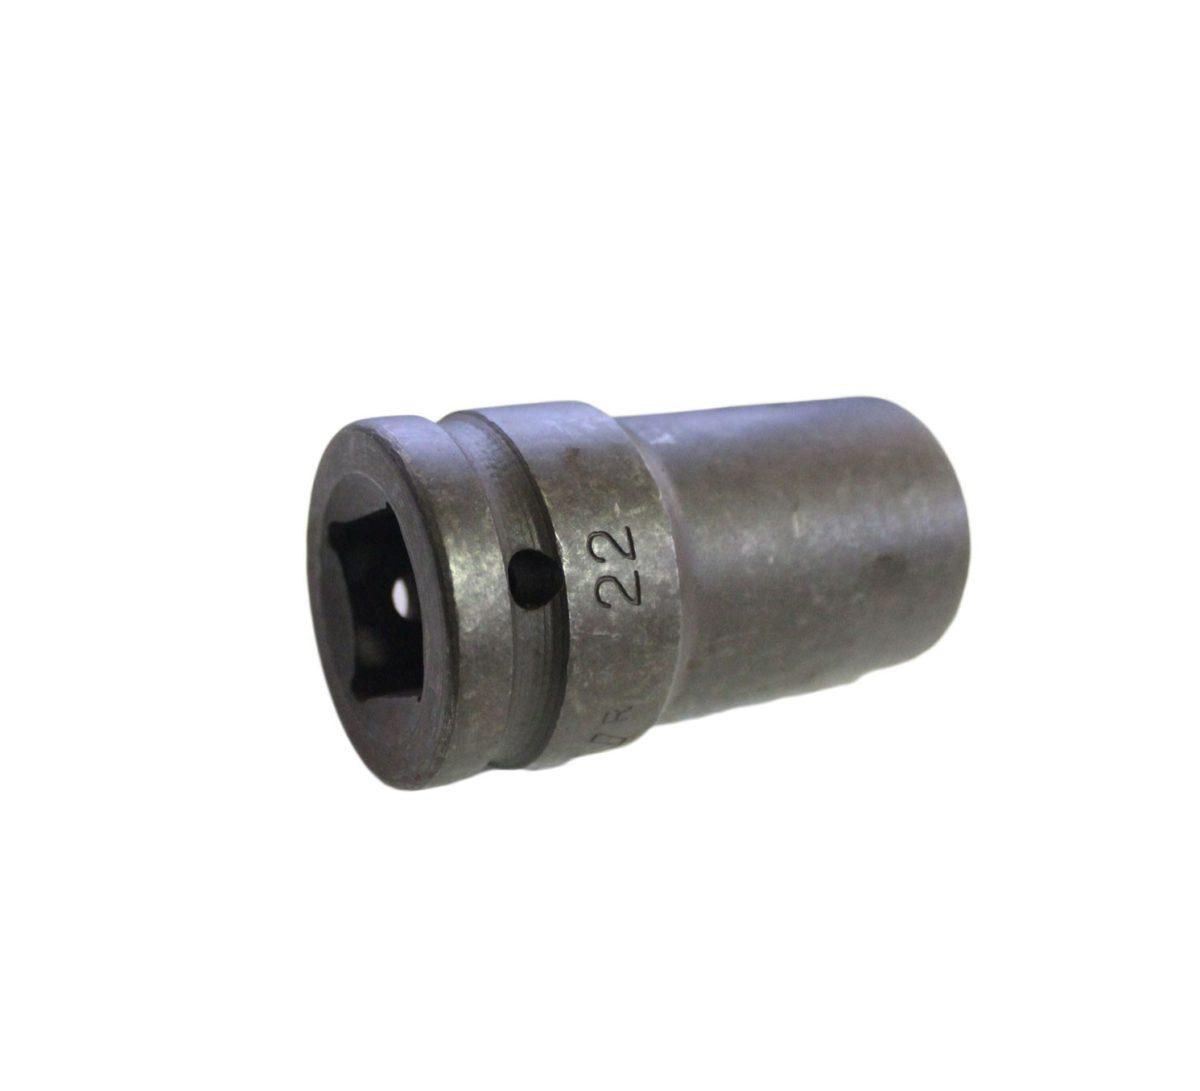 SARV Hex 22mm Deep Impact socket for Wheel Nut Extraction